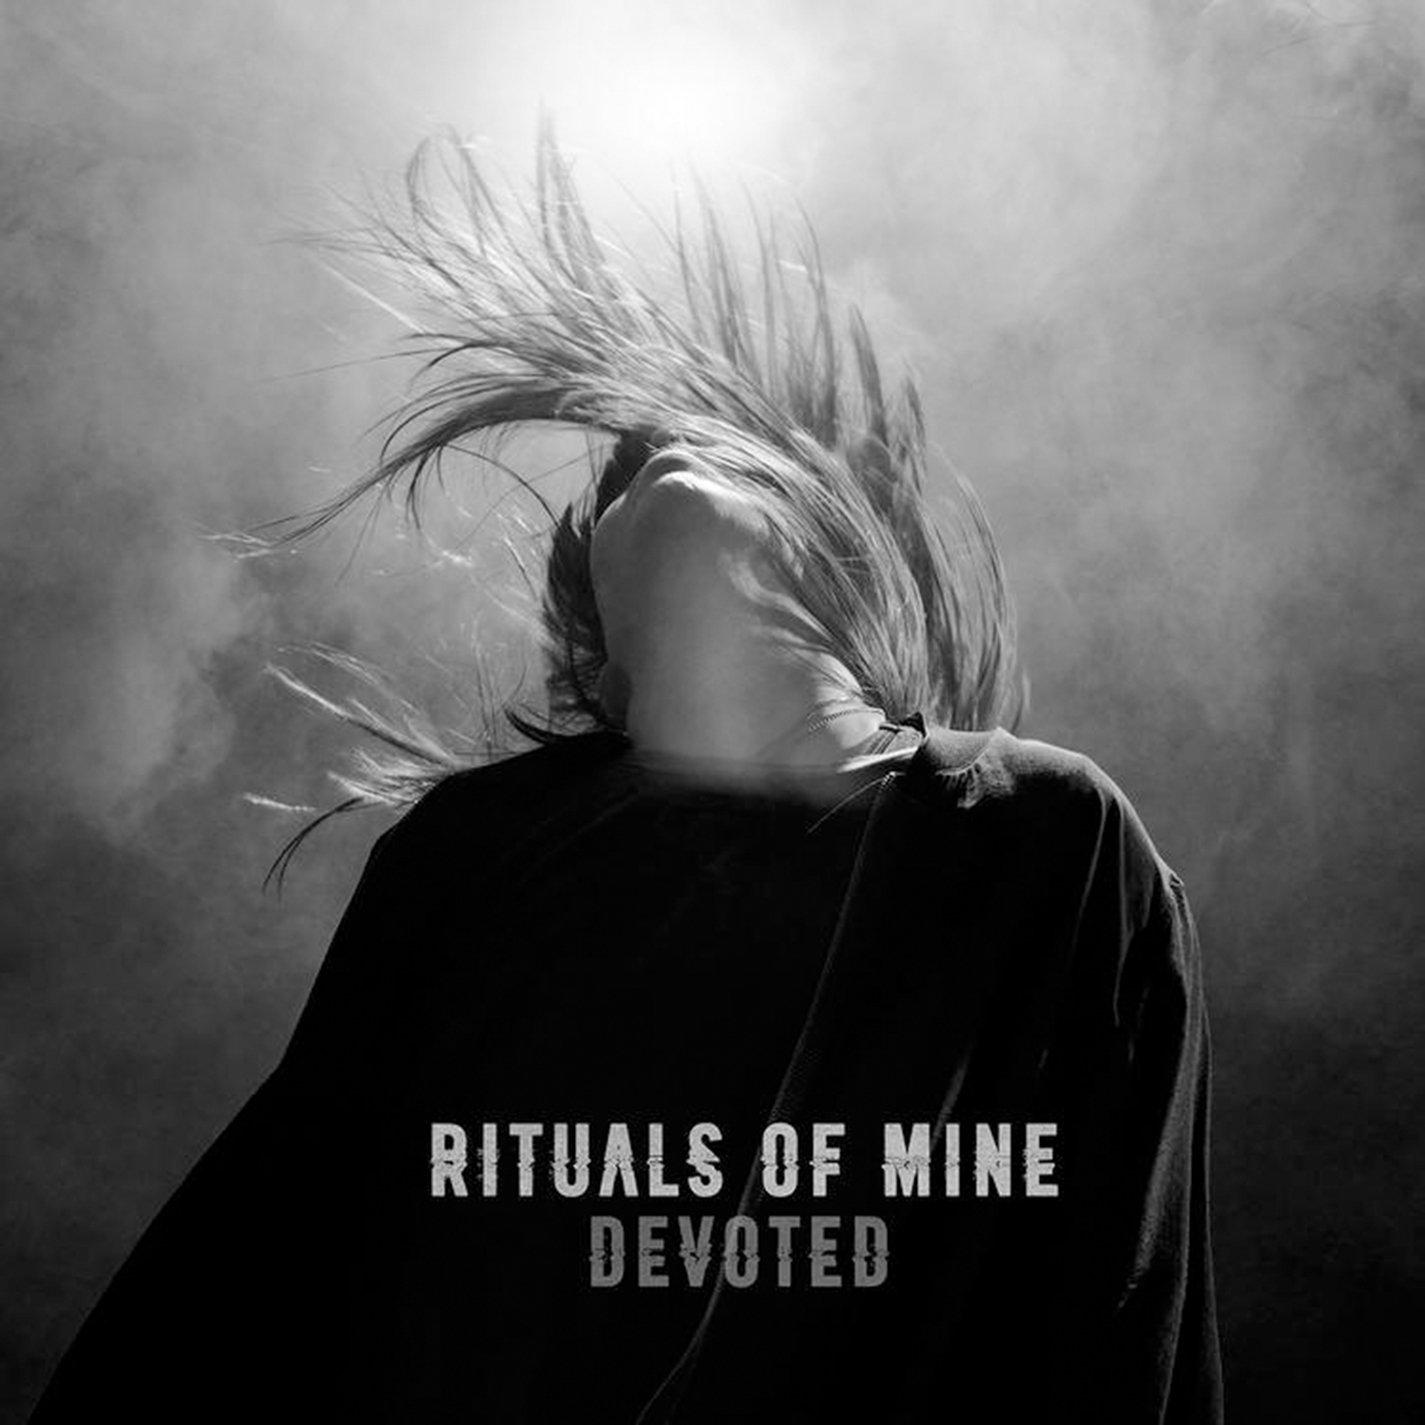 Rituals of Mine - Devoted [Explicit Content] (LP Vinyl)